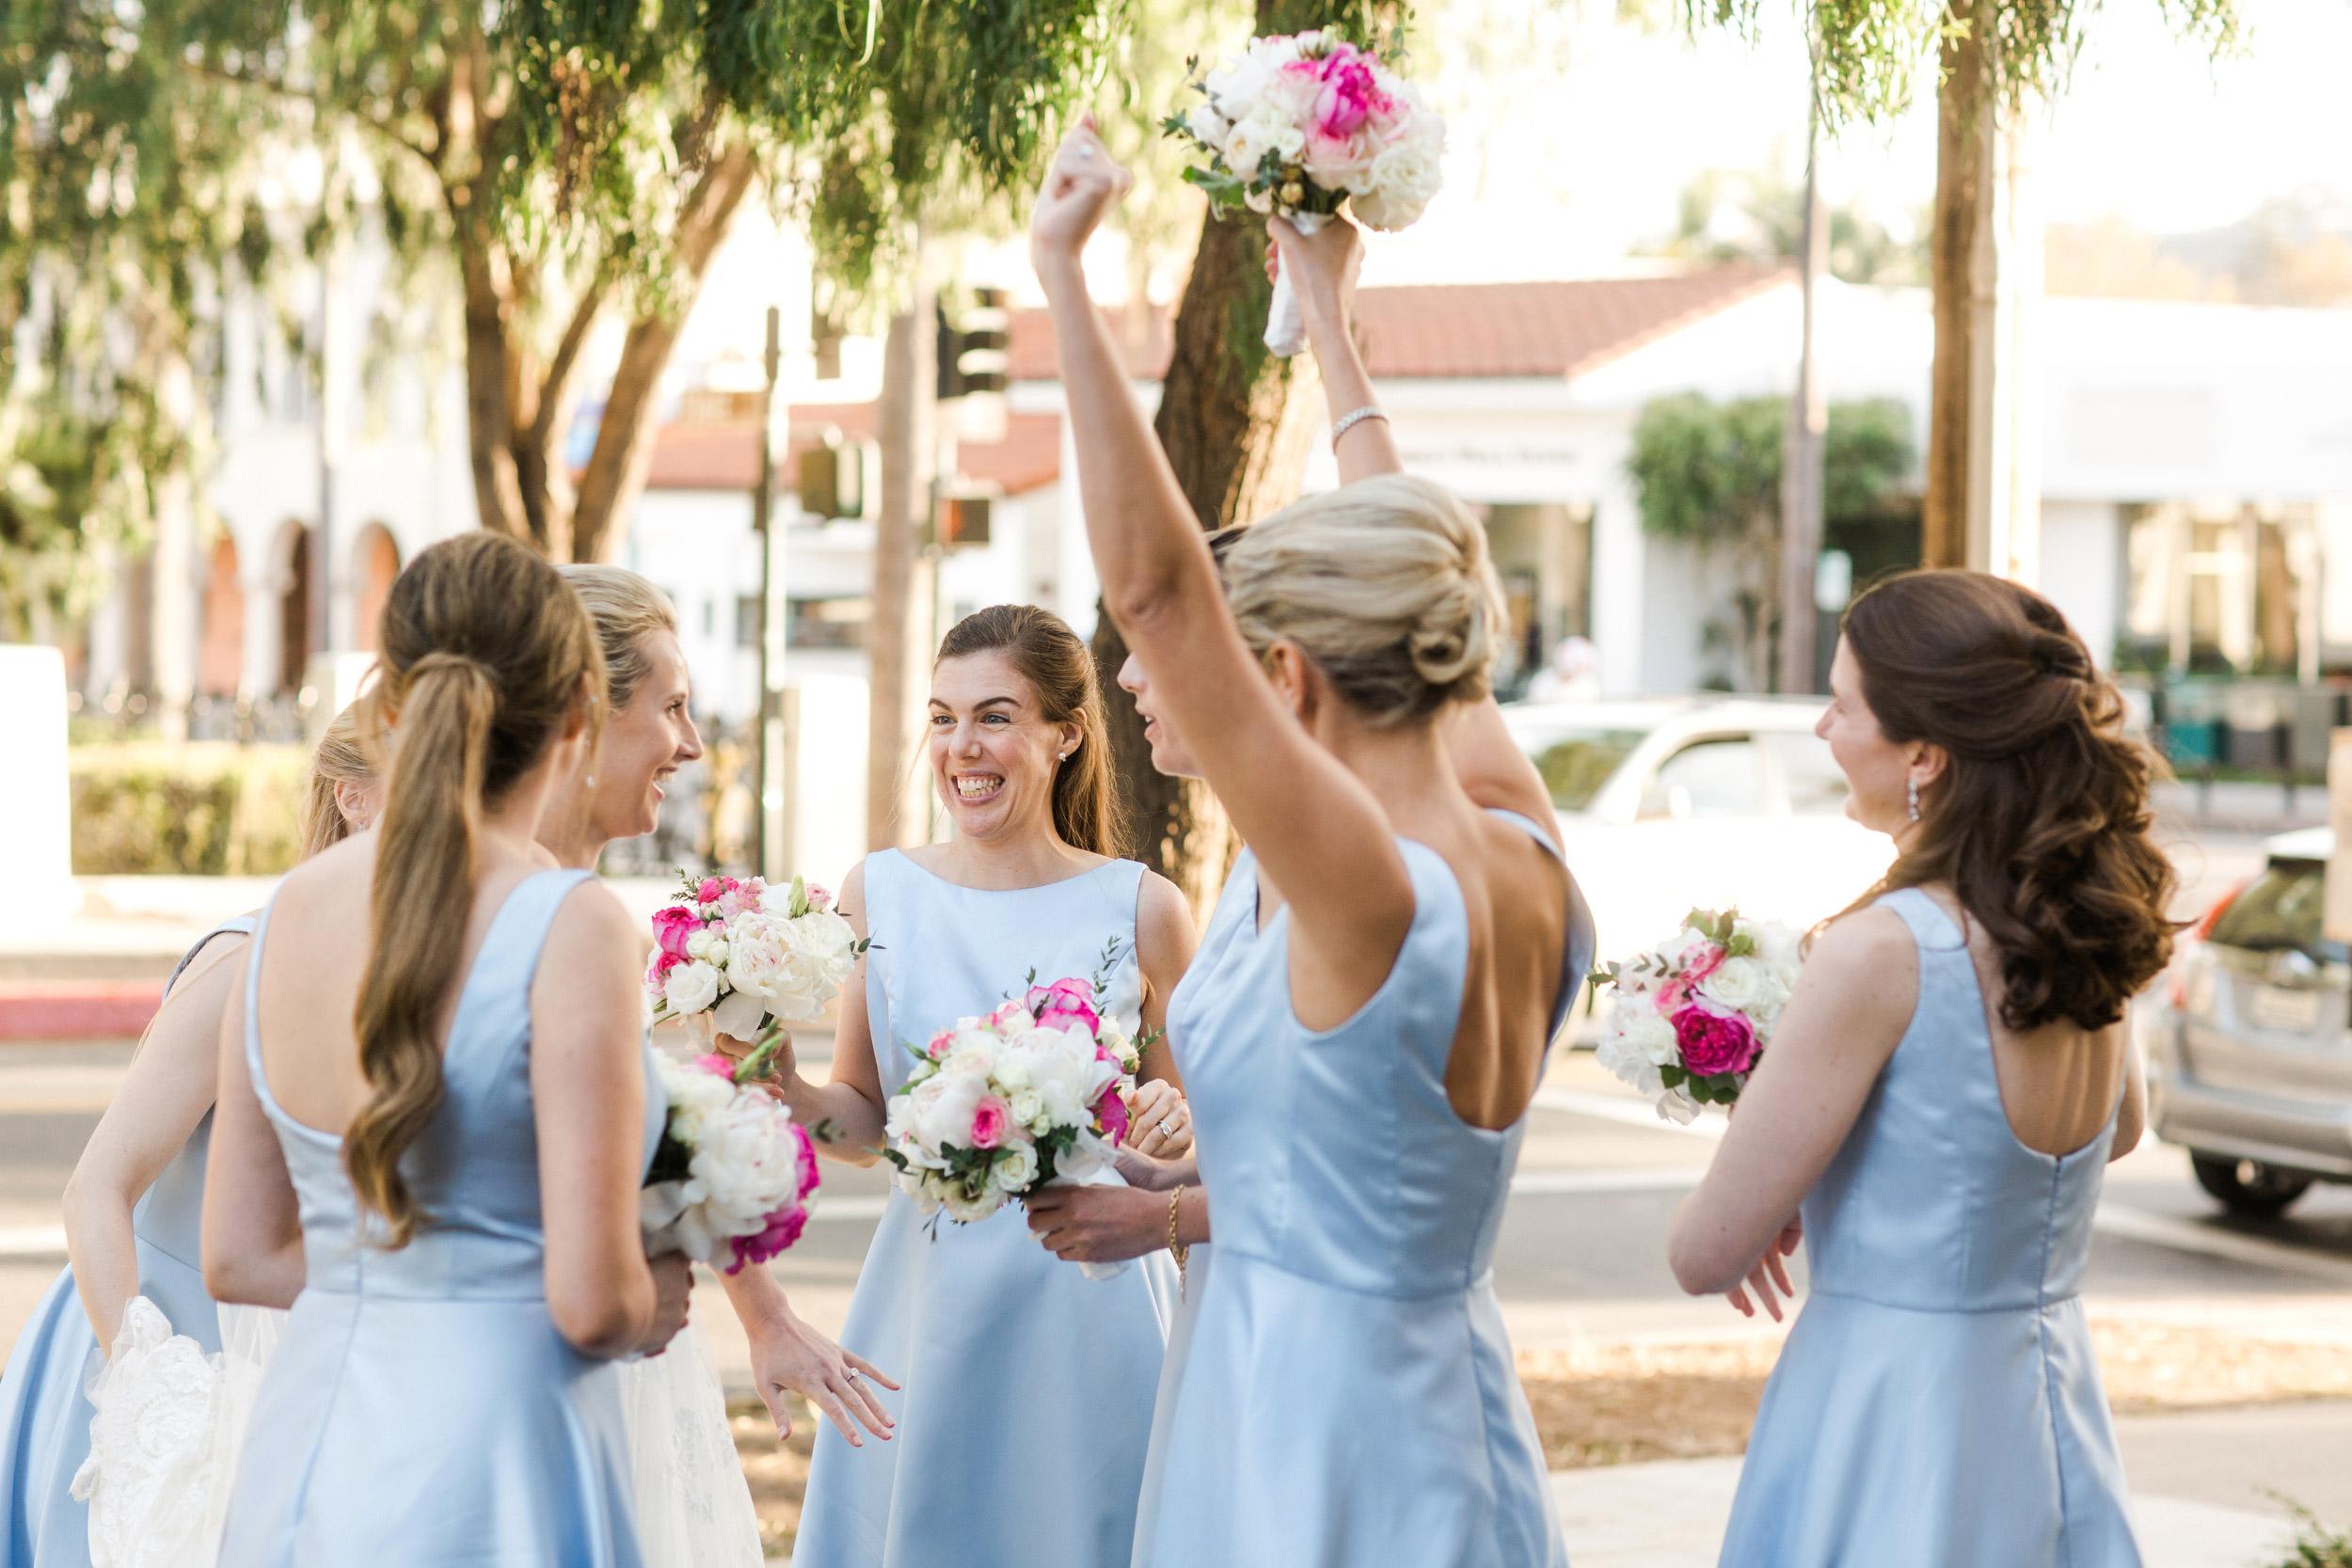 biltmore_santa_barbara_wedding_photos_coral_casino_015.jpg